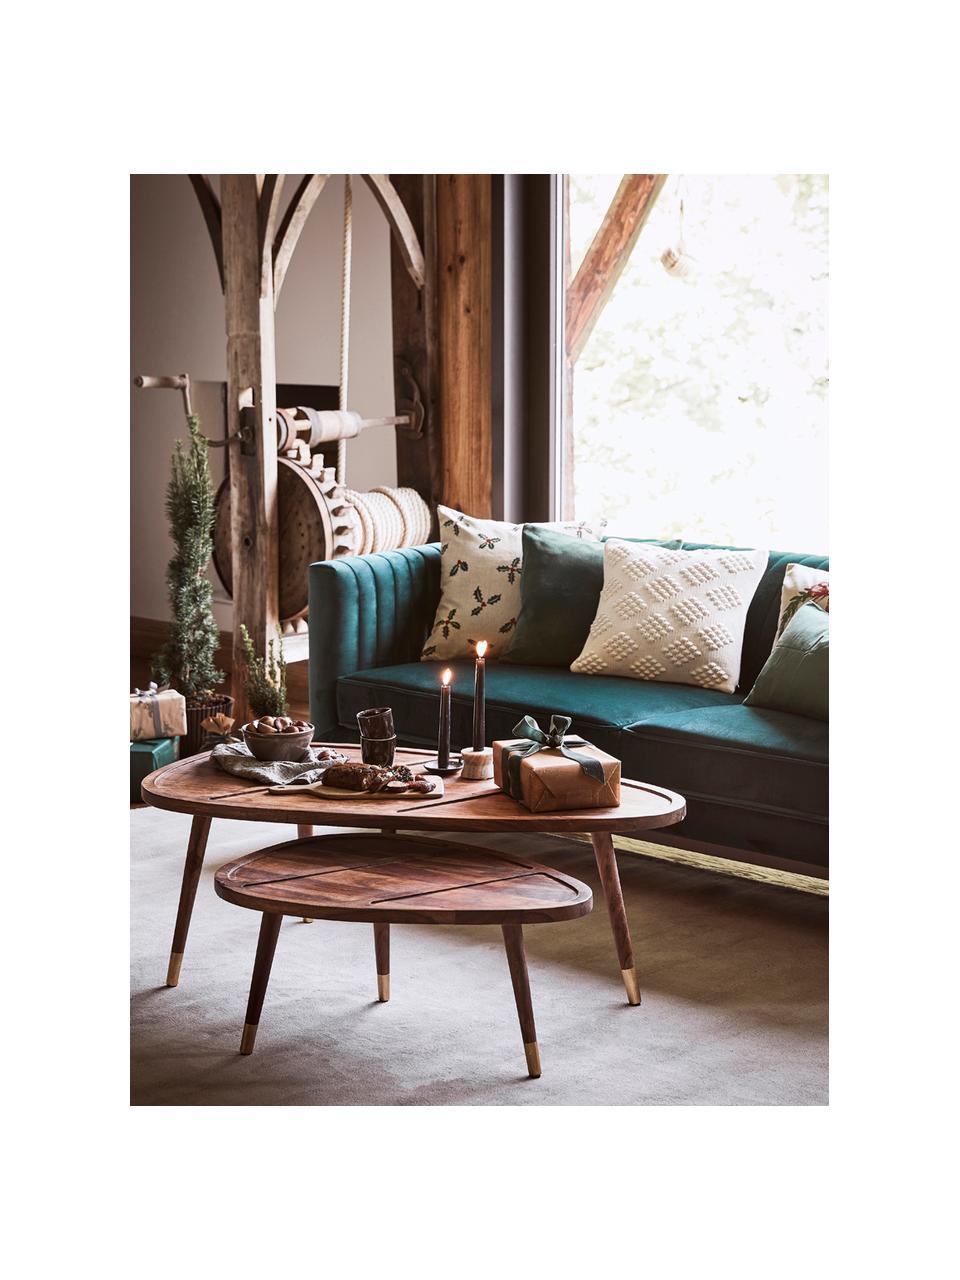 Samt-Sofa Dante (2-Sitzer) in Grün mit Holz-Füßen, Bezug: Polyestersamt, Gestell: Kautschukbaumholz, klarla, Samt Grün, B 174 x T 87 cm